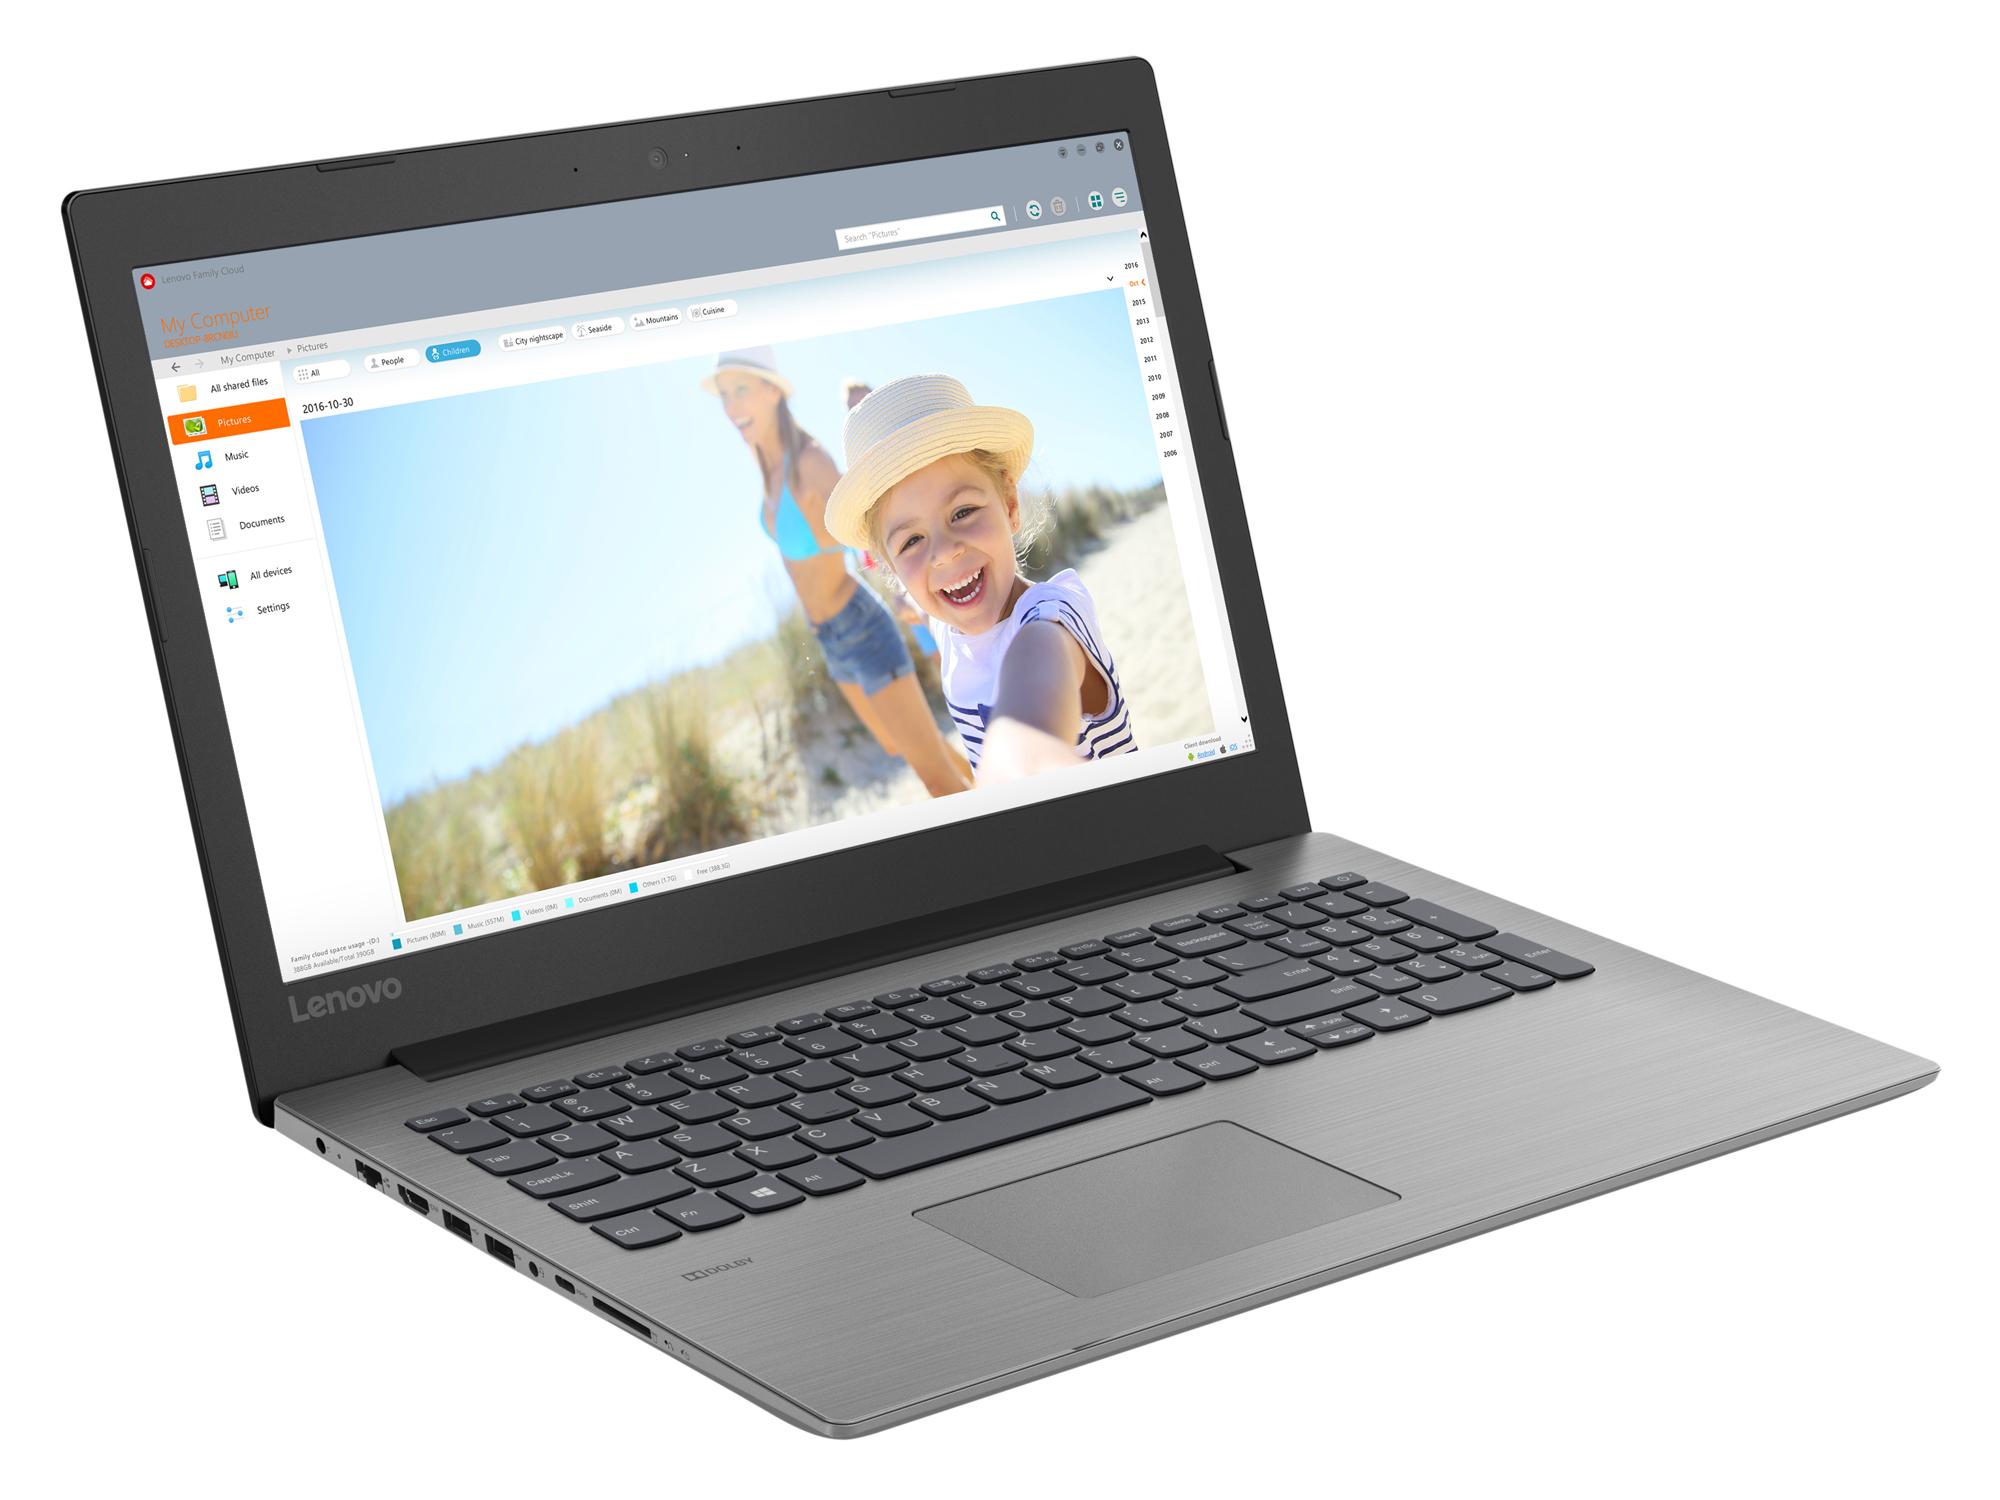 Фото  Ноутбук Lenovo ideapad 330-15 Onyx Black (81D100KBRA)